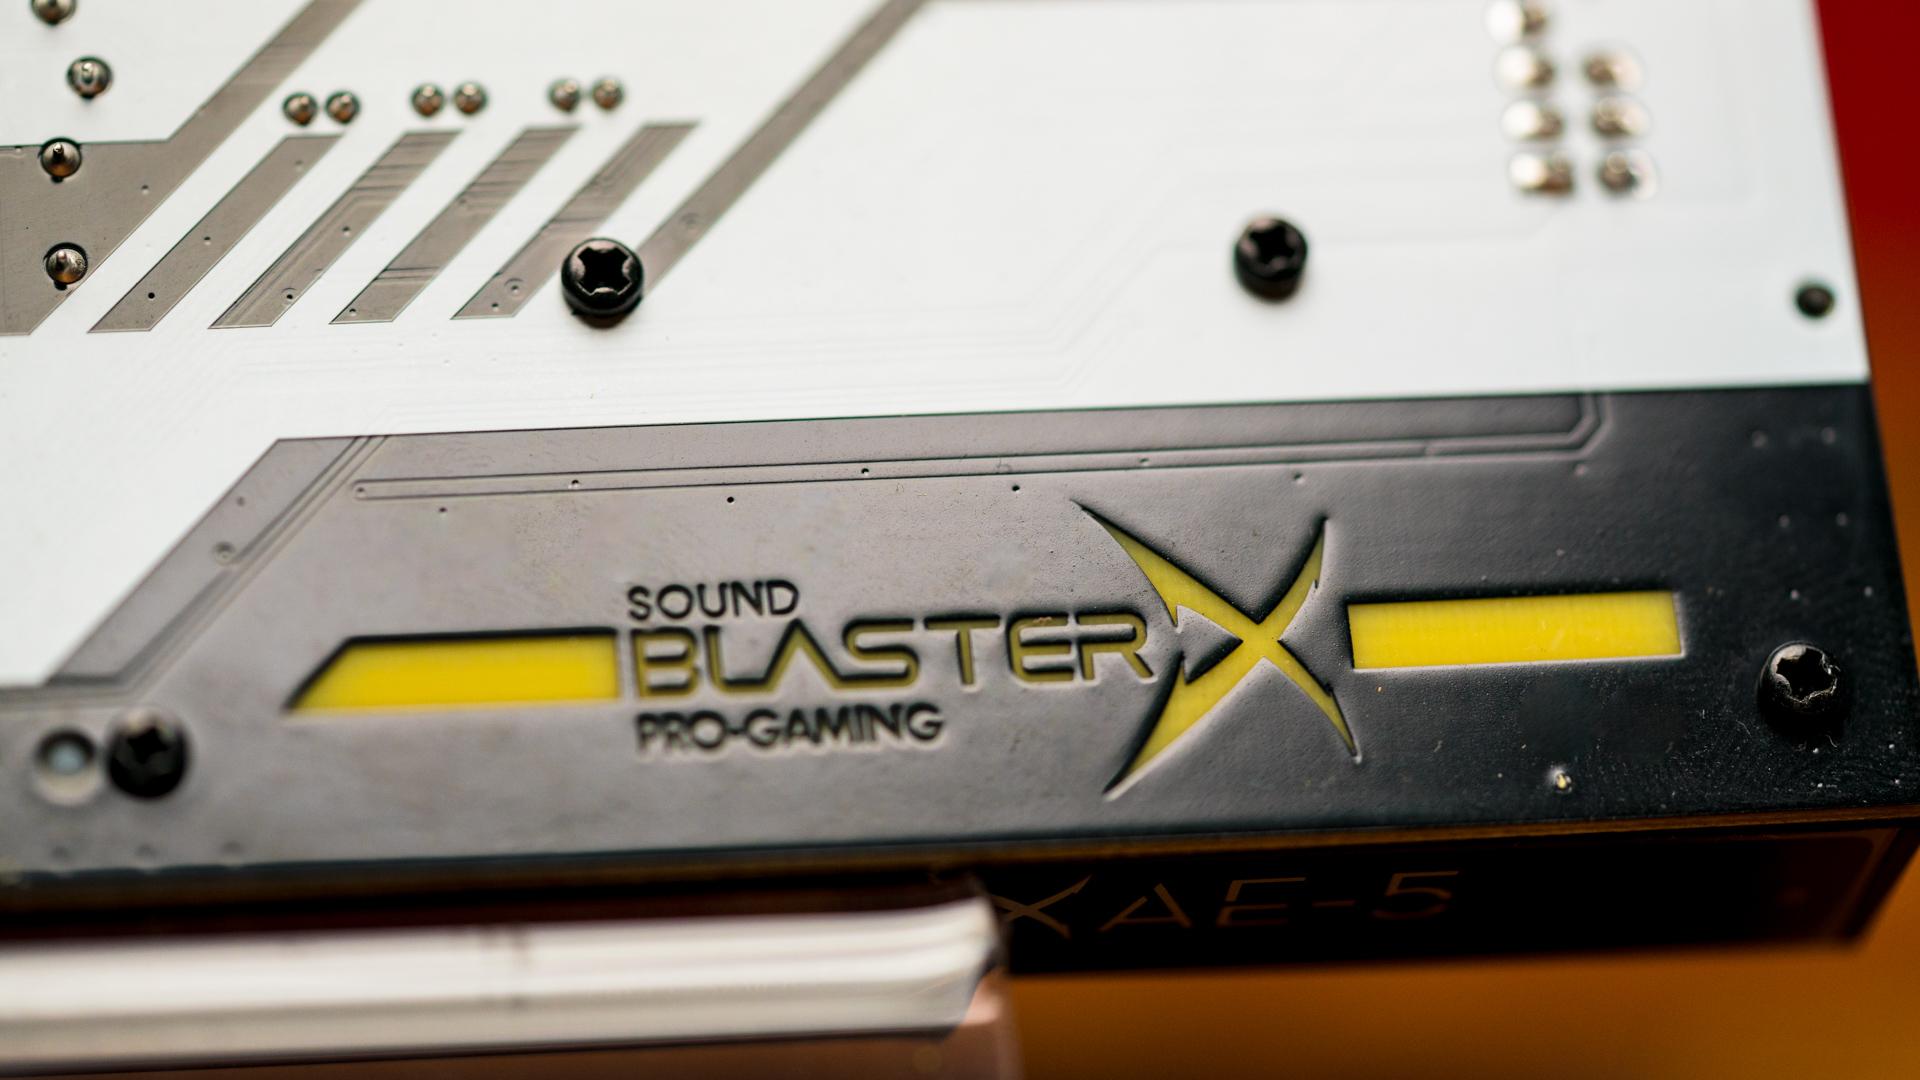 Soundblaster X-10 sound card